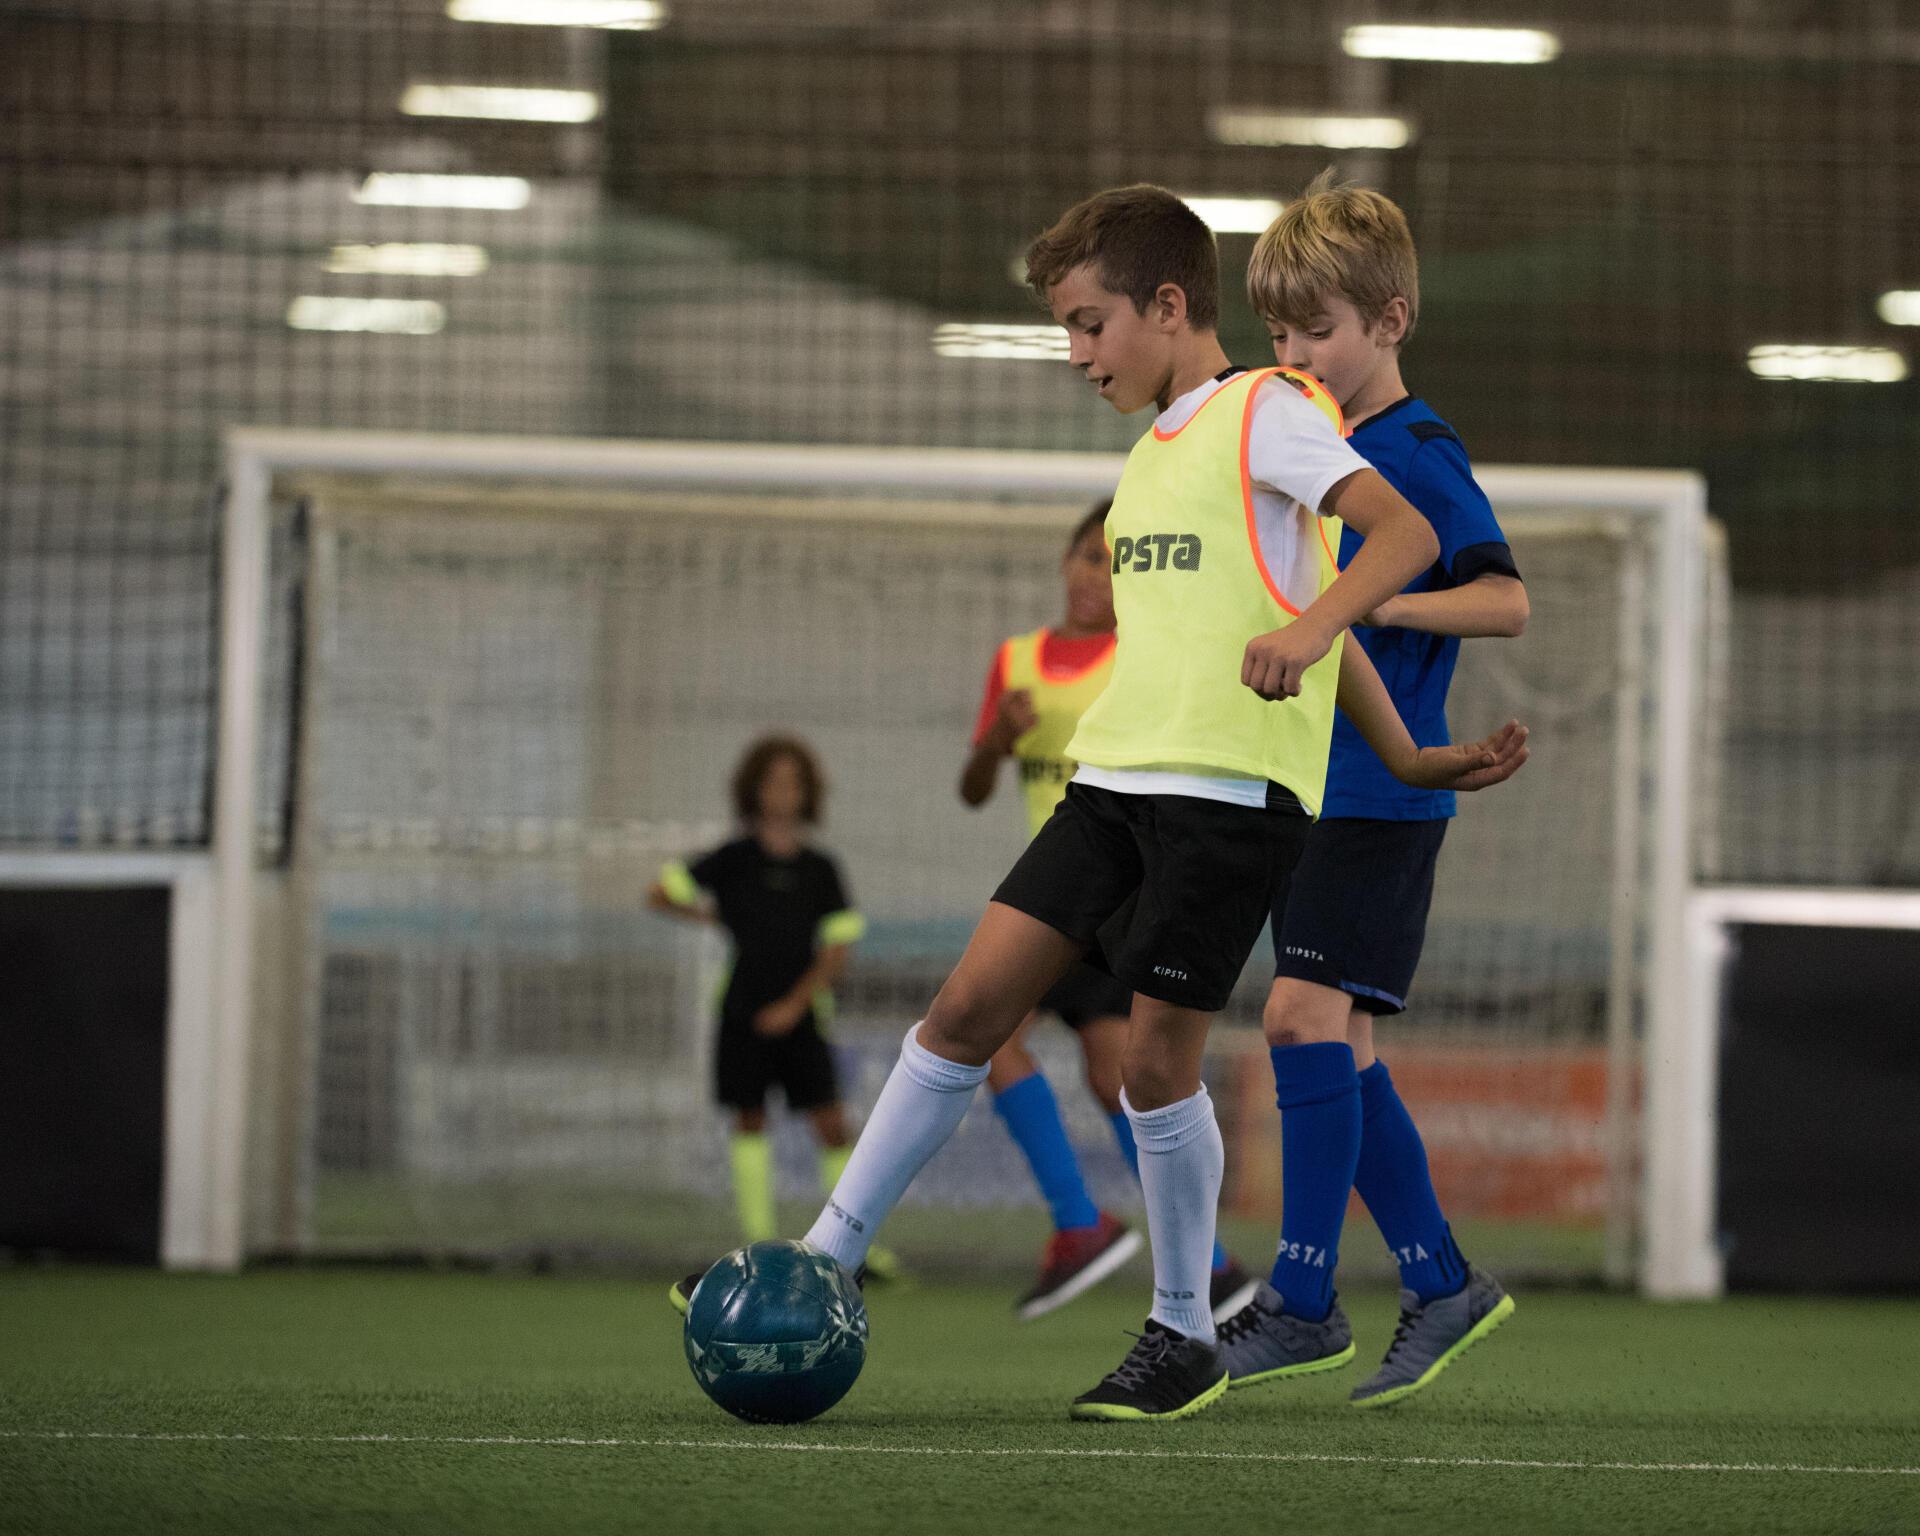 votre enfant debute le football